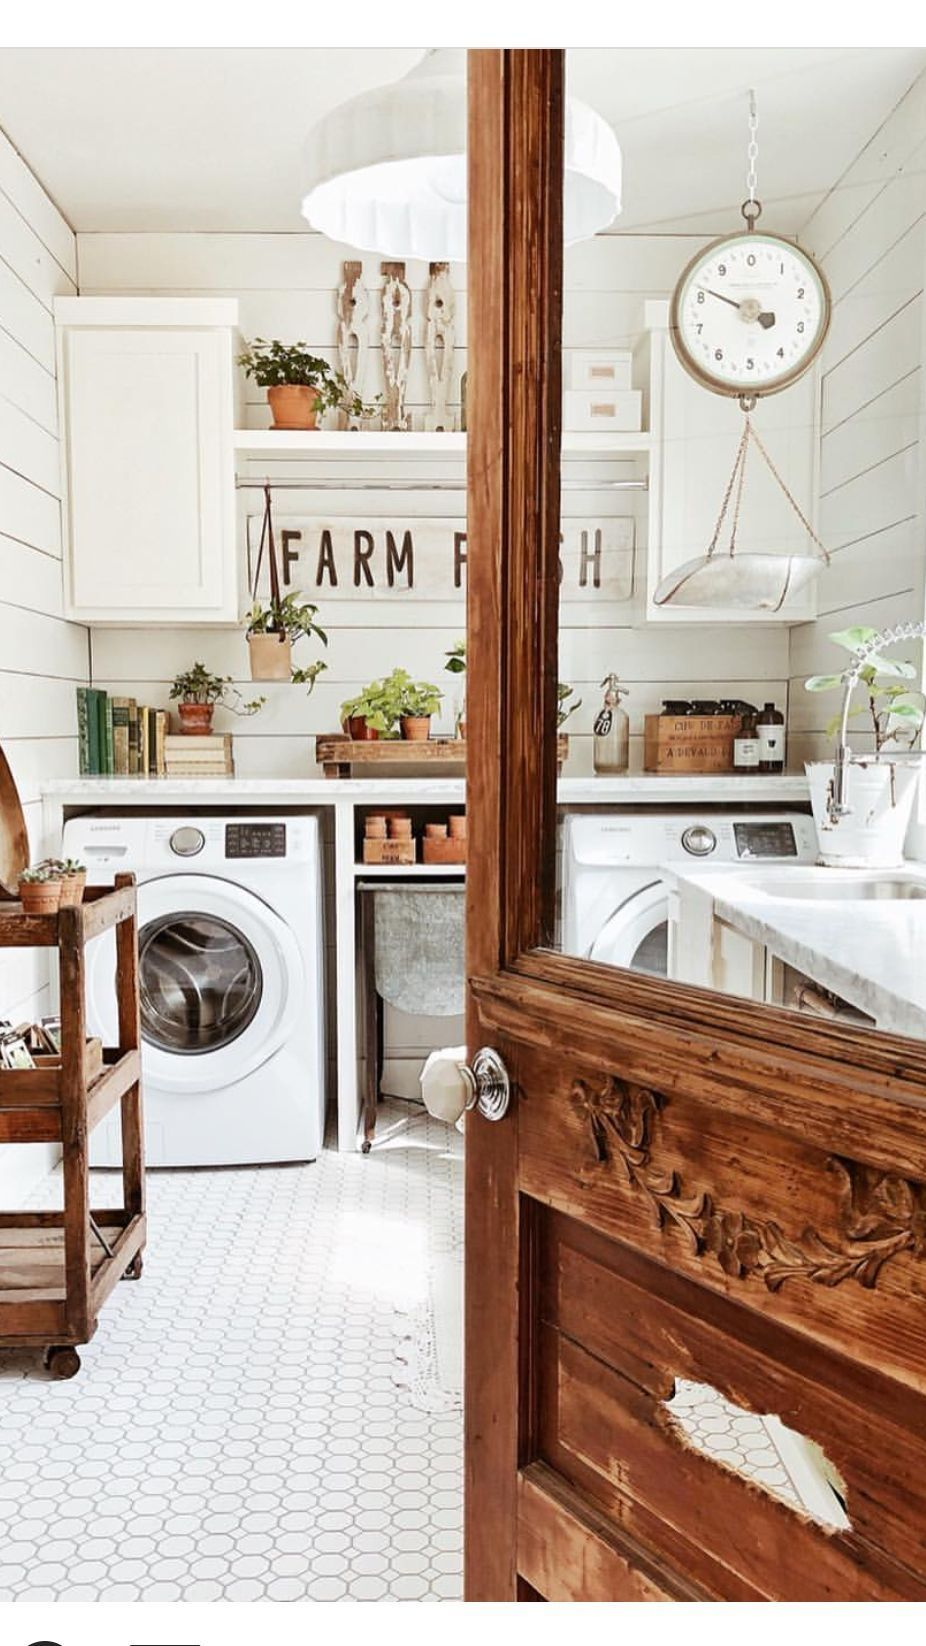 43 Magnificient Farmhouse Laundry Room Ideas Farmhouse Laundry